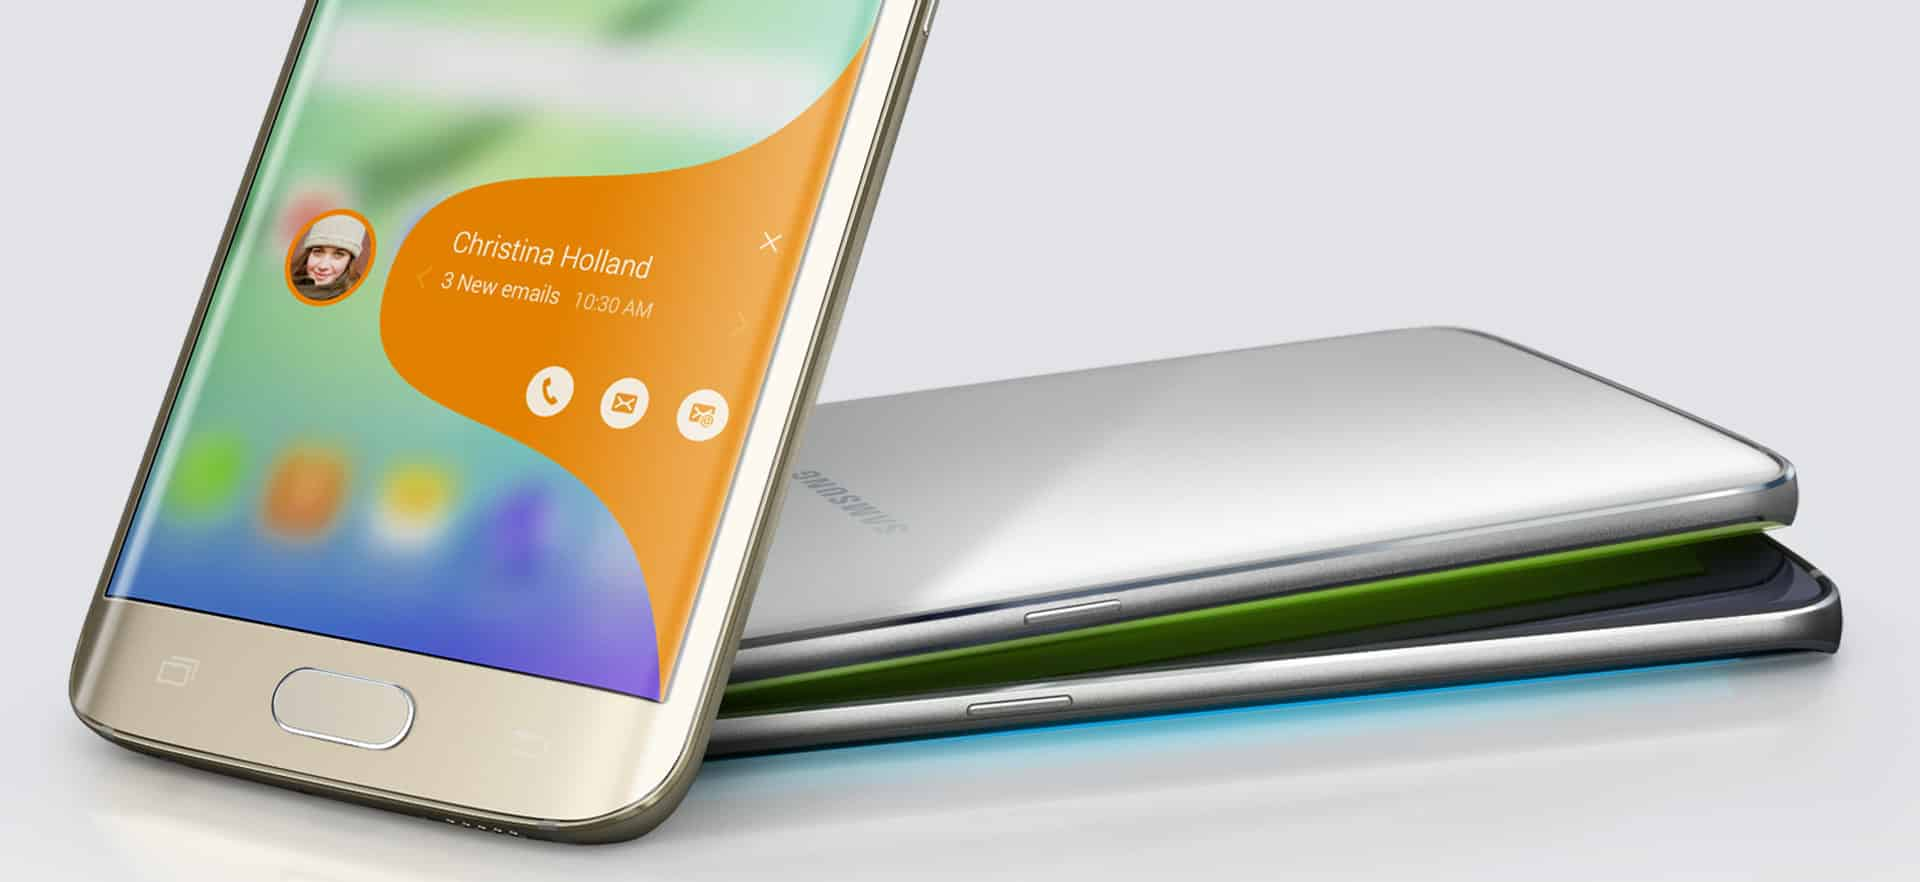 22516193_0_1_PROD_15 لماذا تتجه سامسونج لإطلاق Galaxy S6 edge Plus ؟